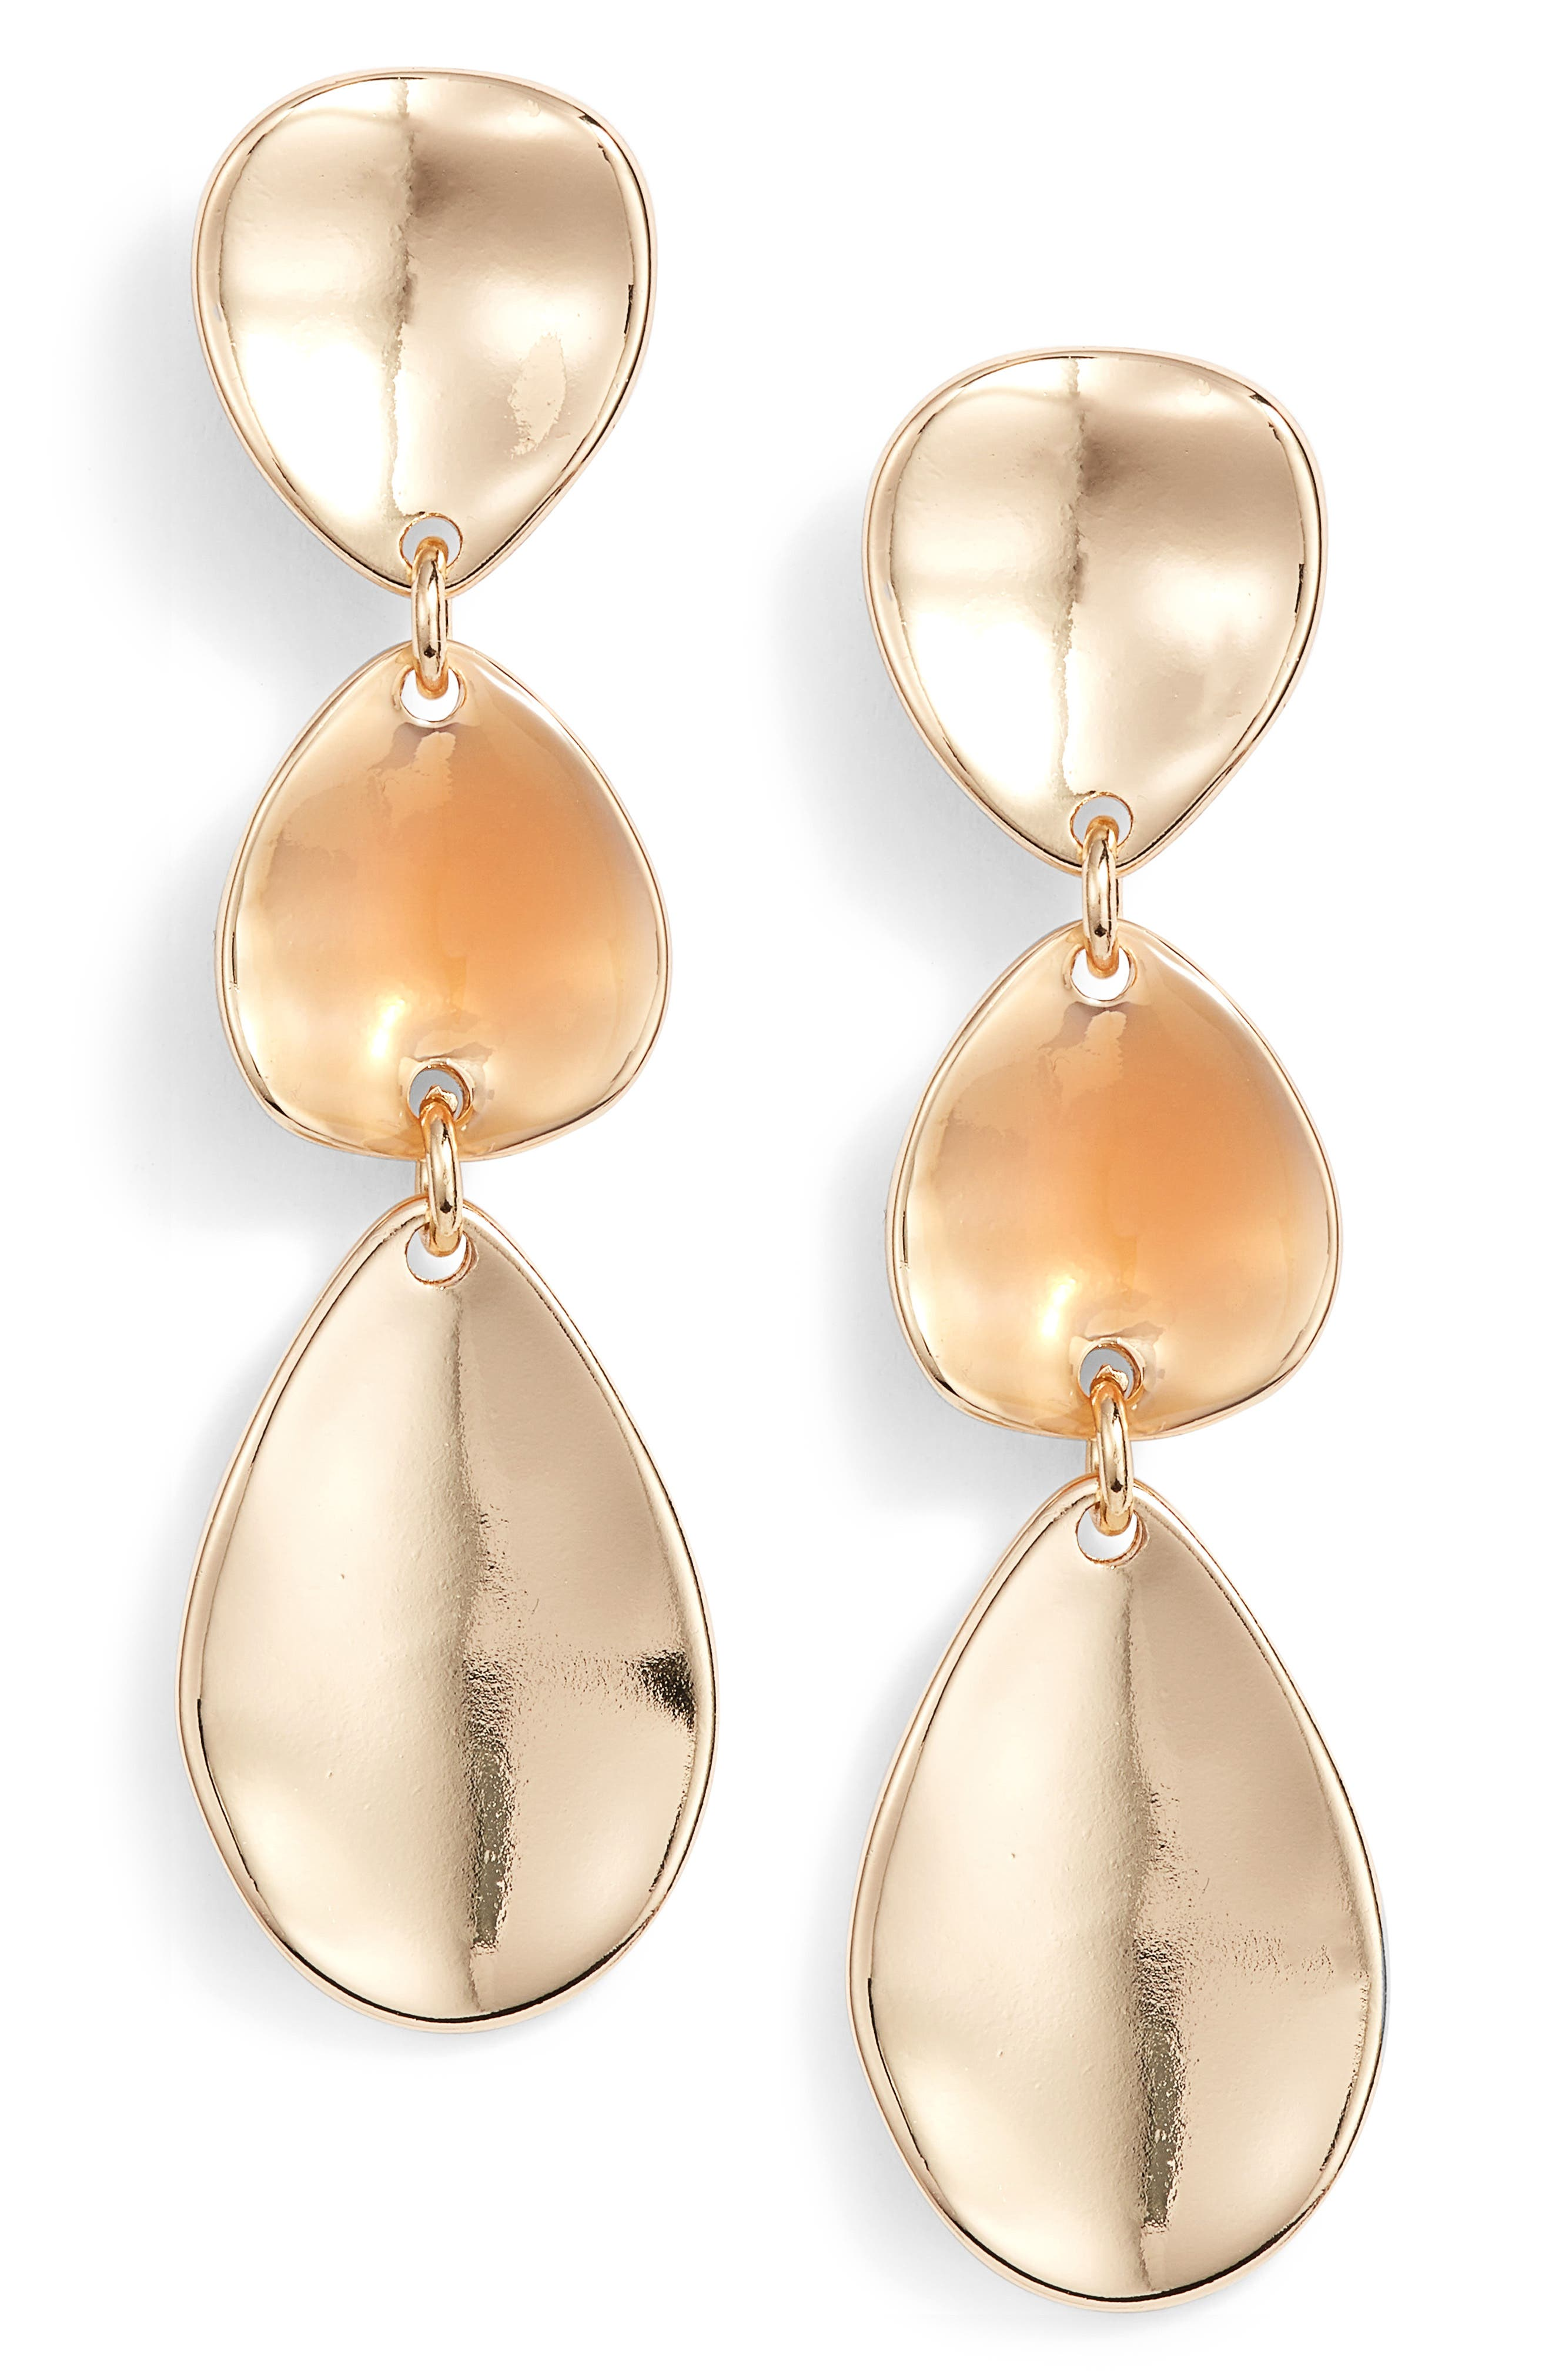 Painted Petal Triple Drop Earrings,                             Main thumbnail 1, color,                             Blush- Gold